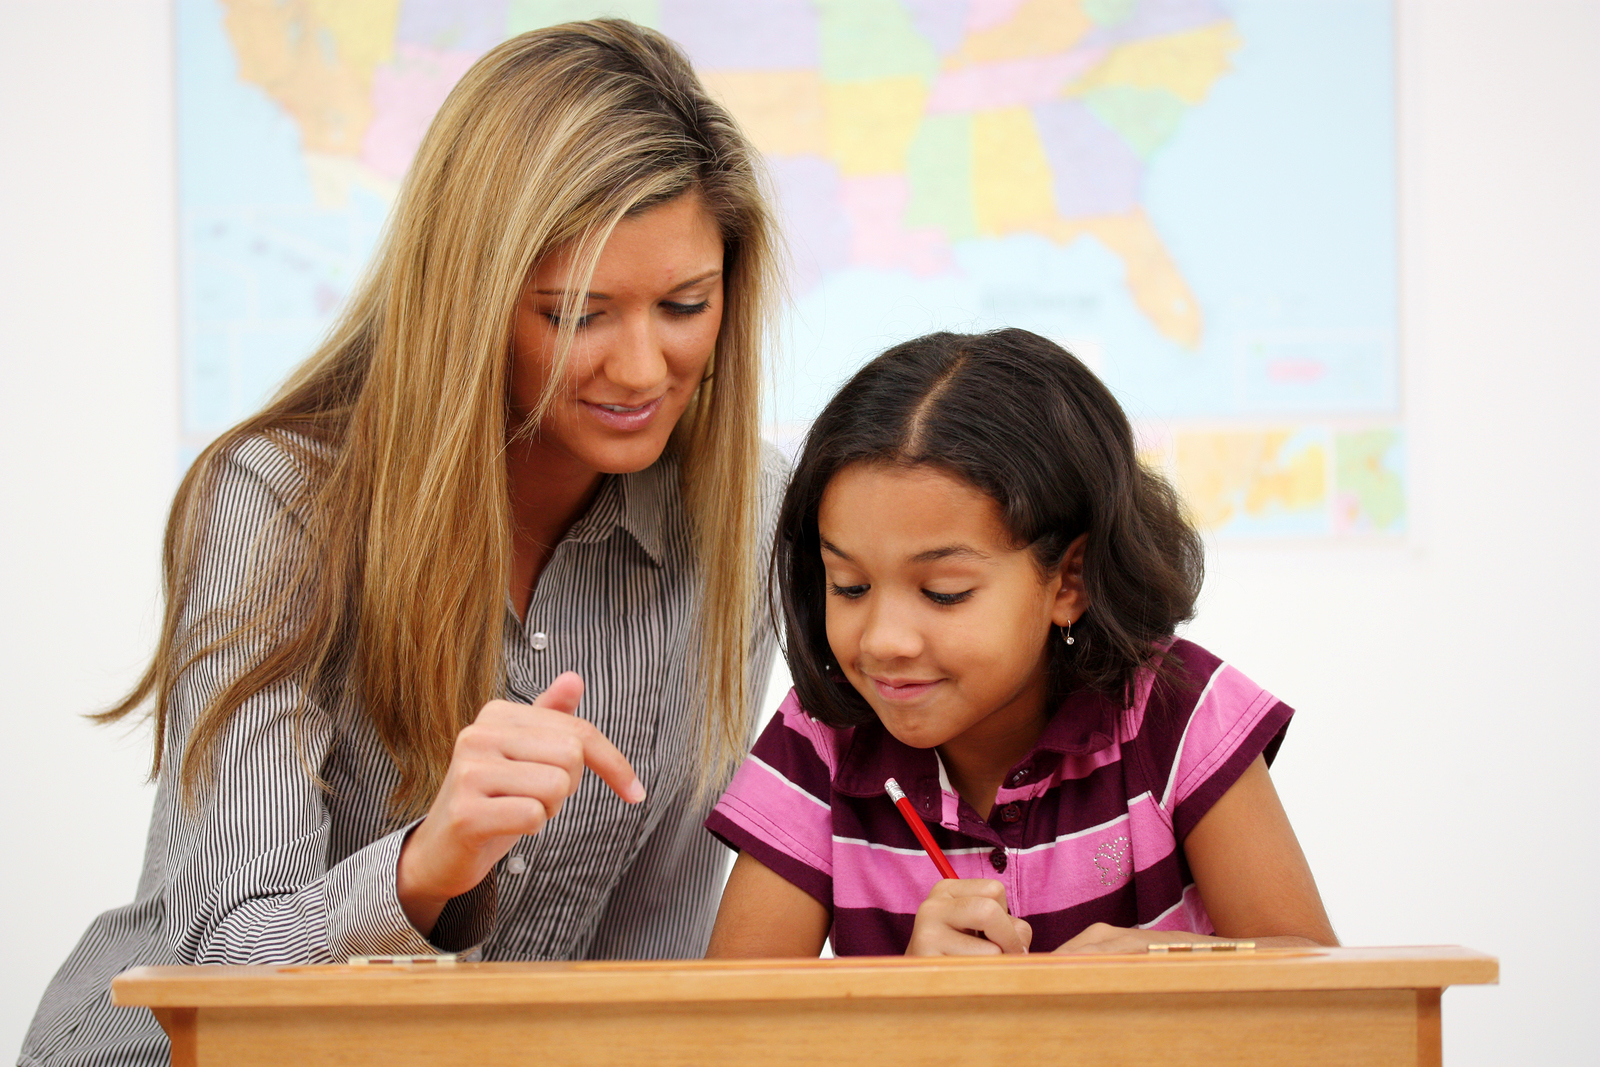 behaviors of a teacher Educational psychology review, vol 7, no 2, 1995 teacher behaviors that foster creativity giselle b esquivel t,2 the literature on teacher behaviors that influence the development of creative.